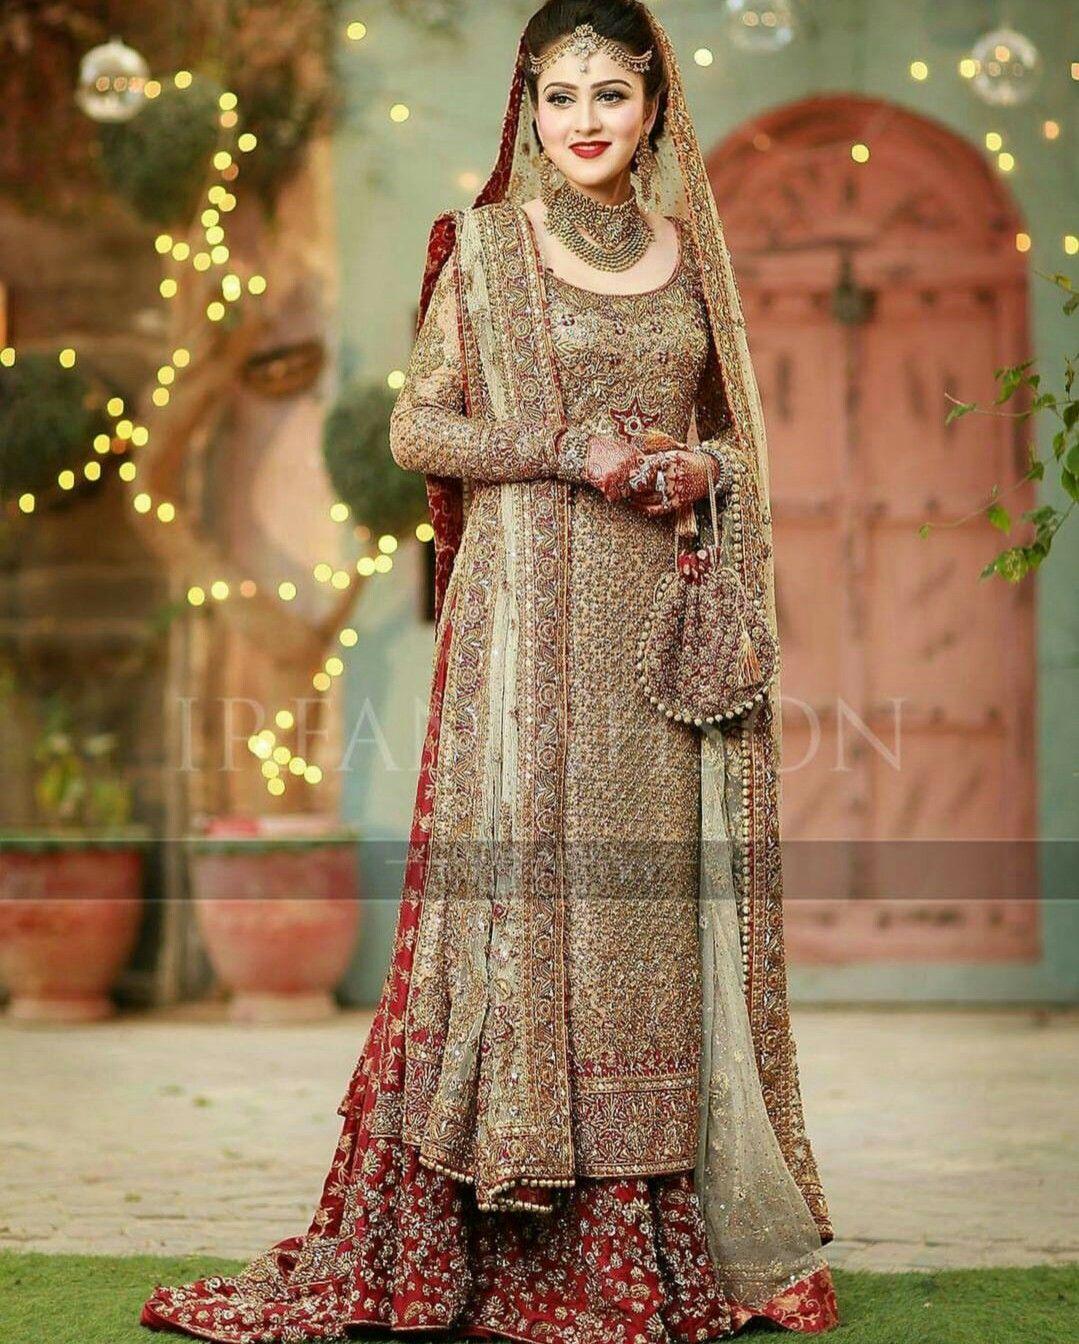 Awesome Pakistani Bridal look   P@Ki WeDDiNG   Pinterest ...